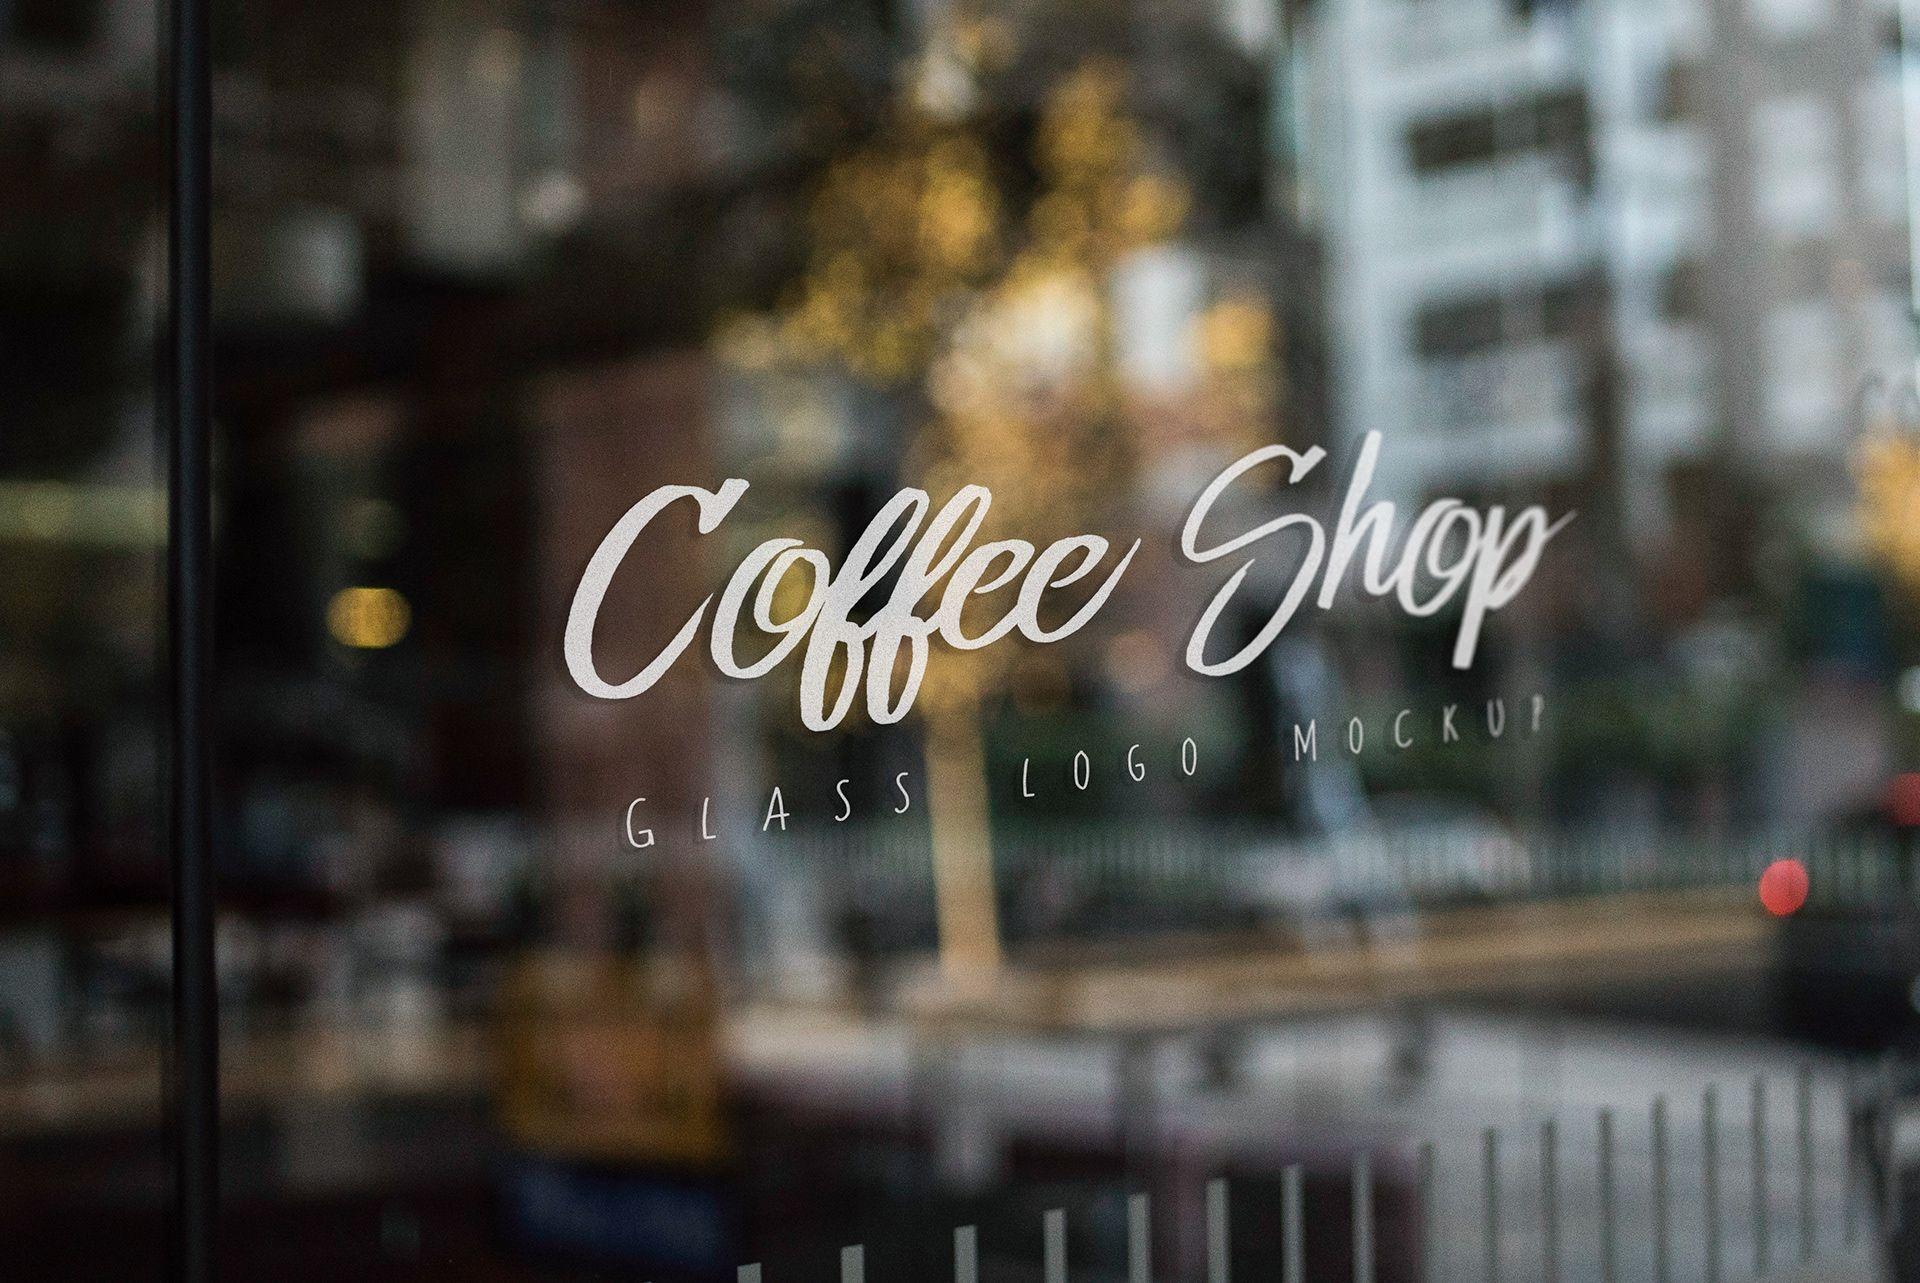 Free Glass Window Shop Sign Mockup on Behance 디자인